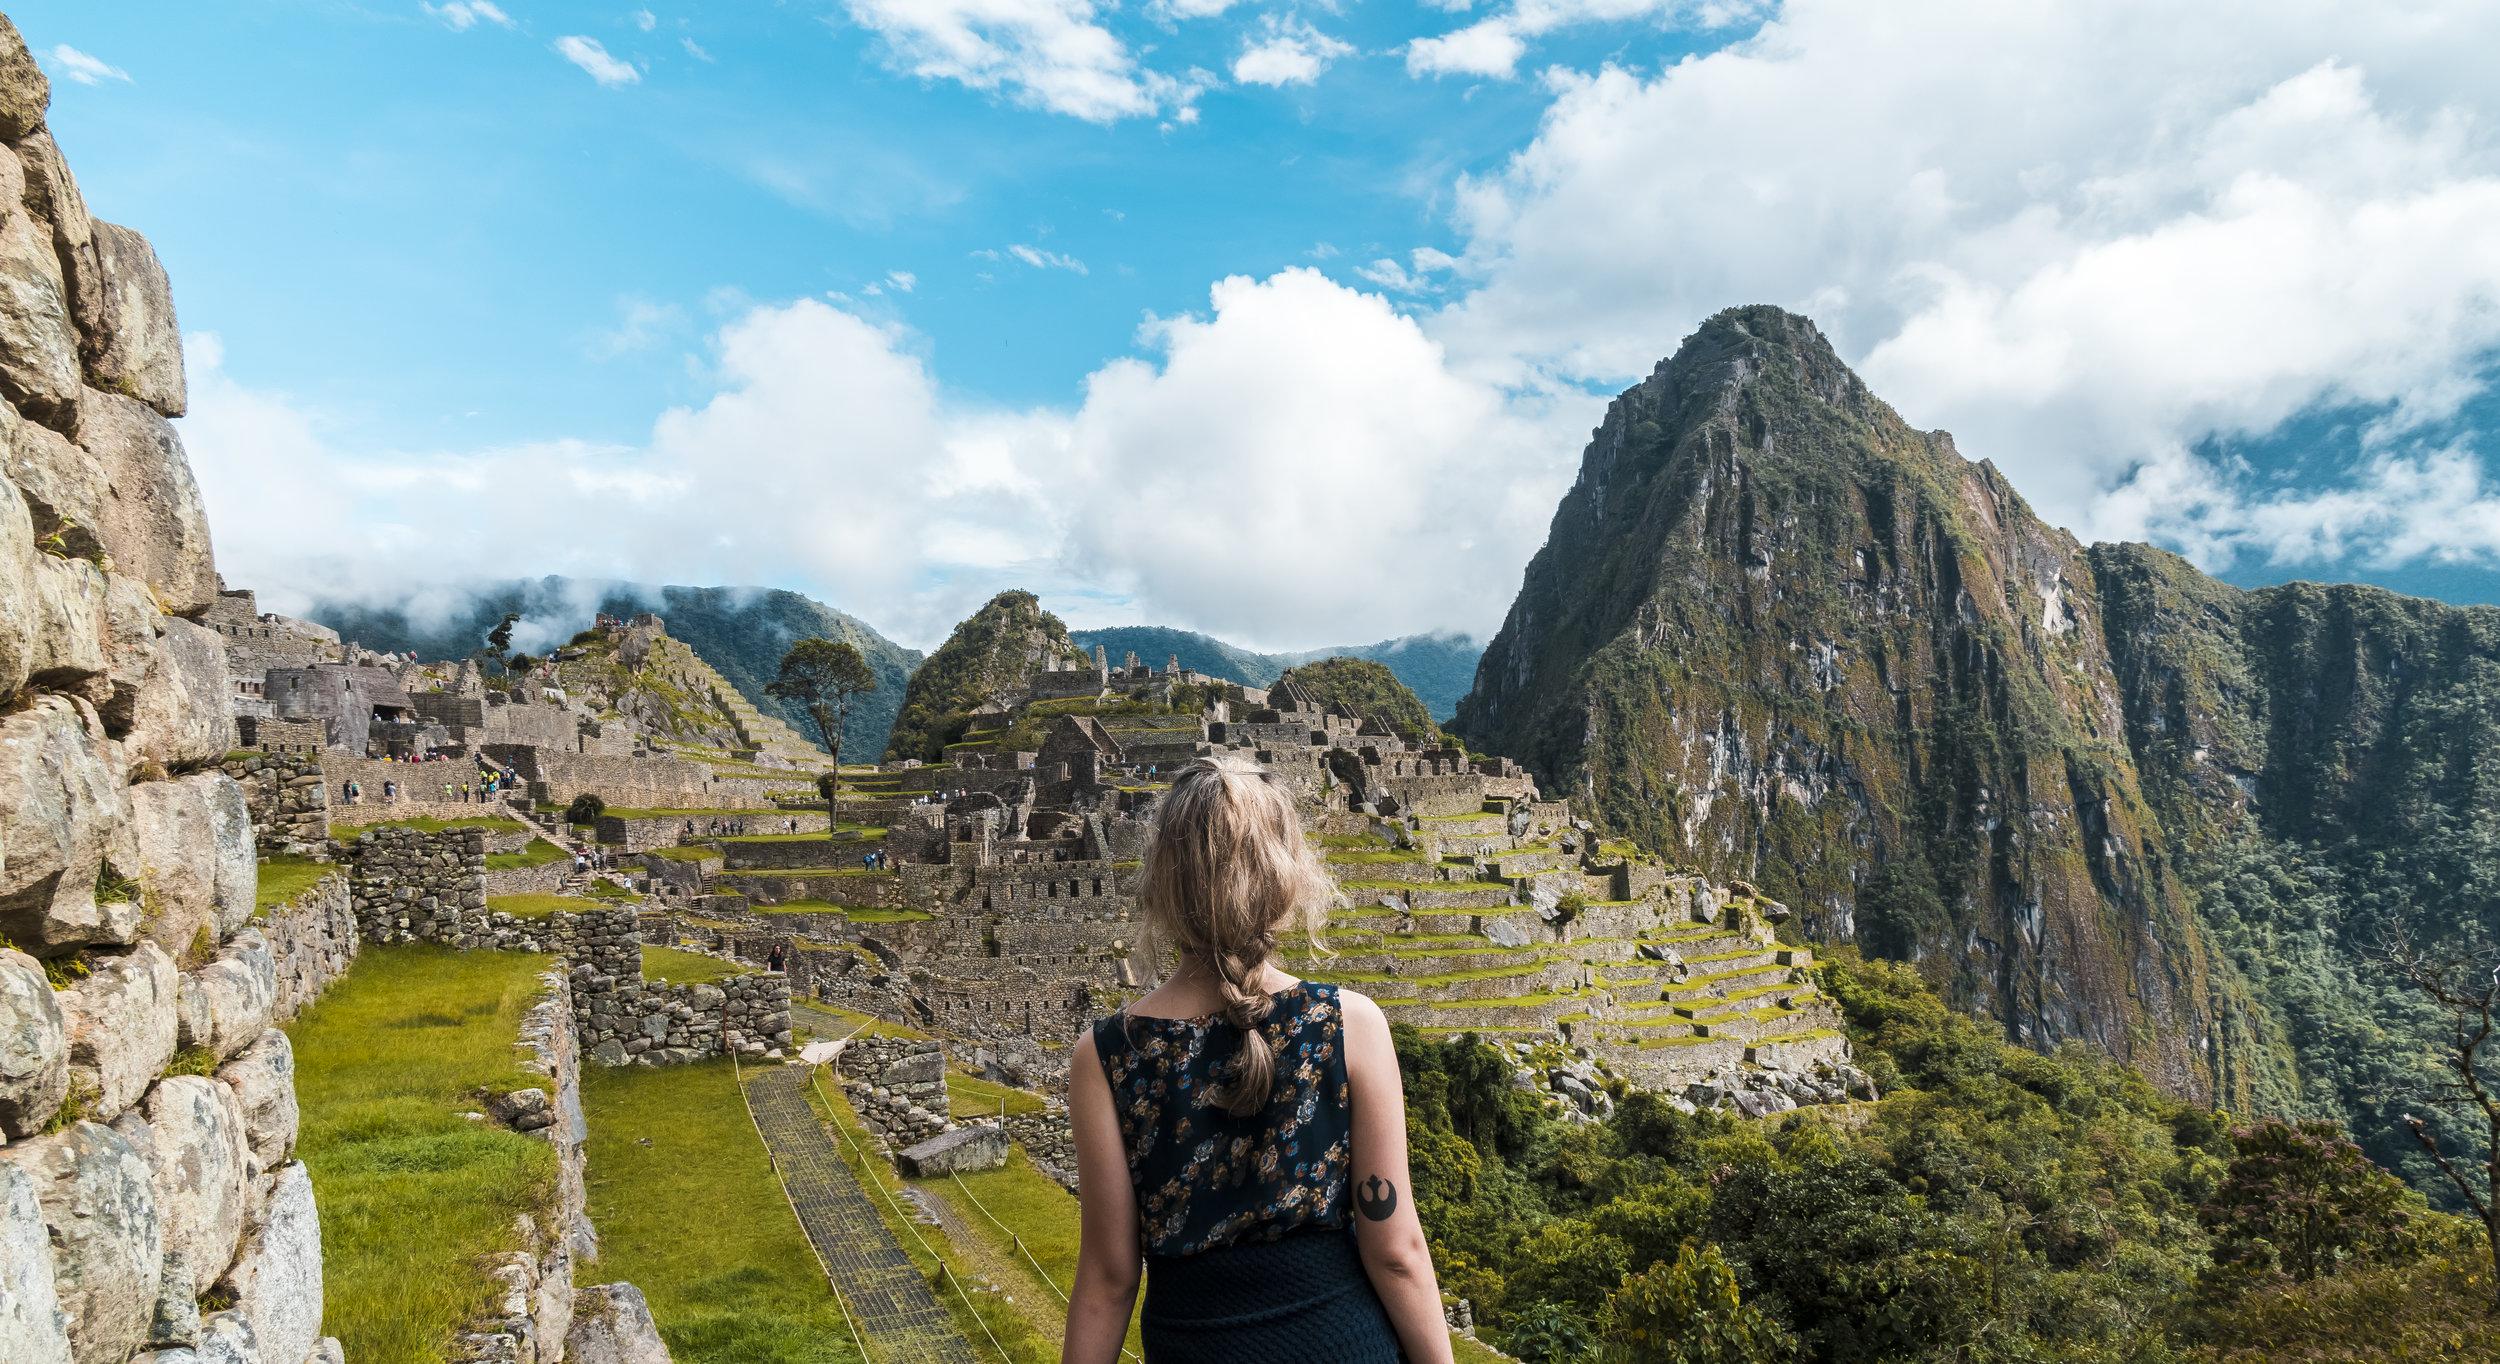 Das große Highlight: Machu Picchu